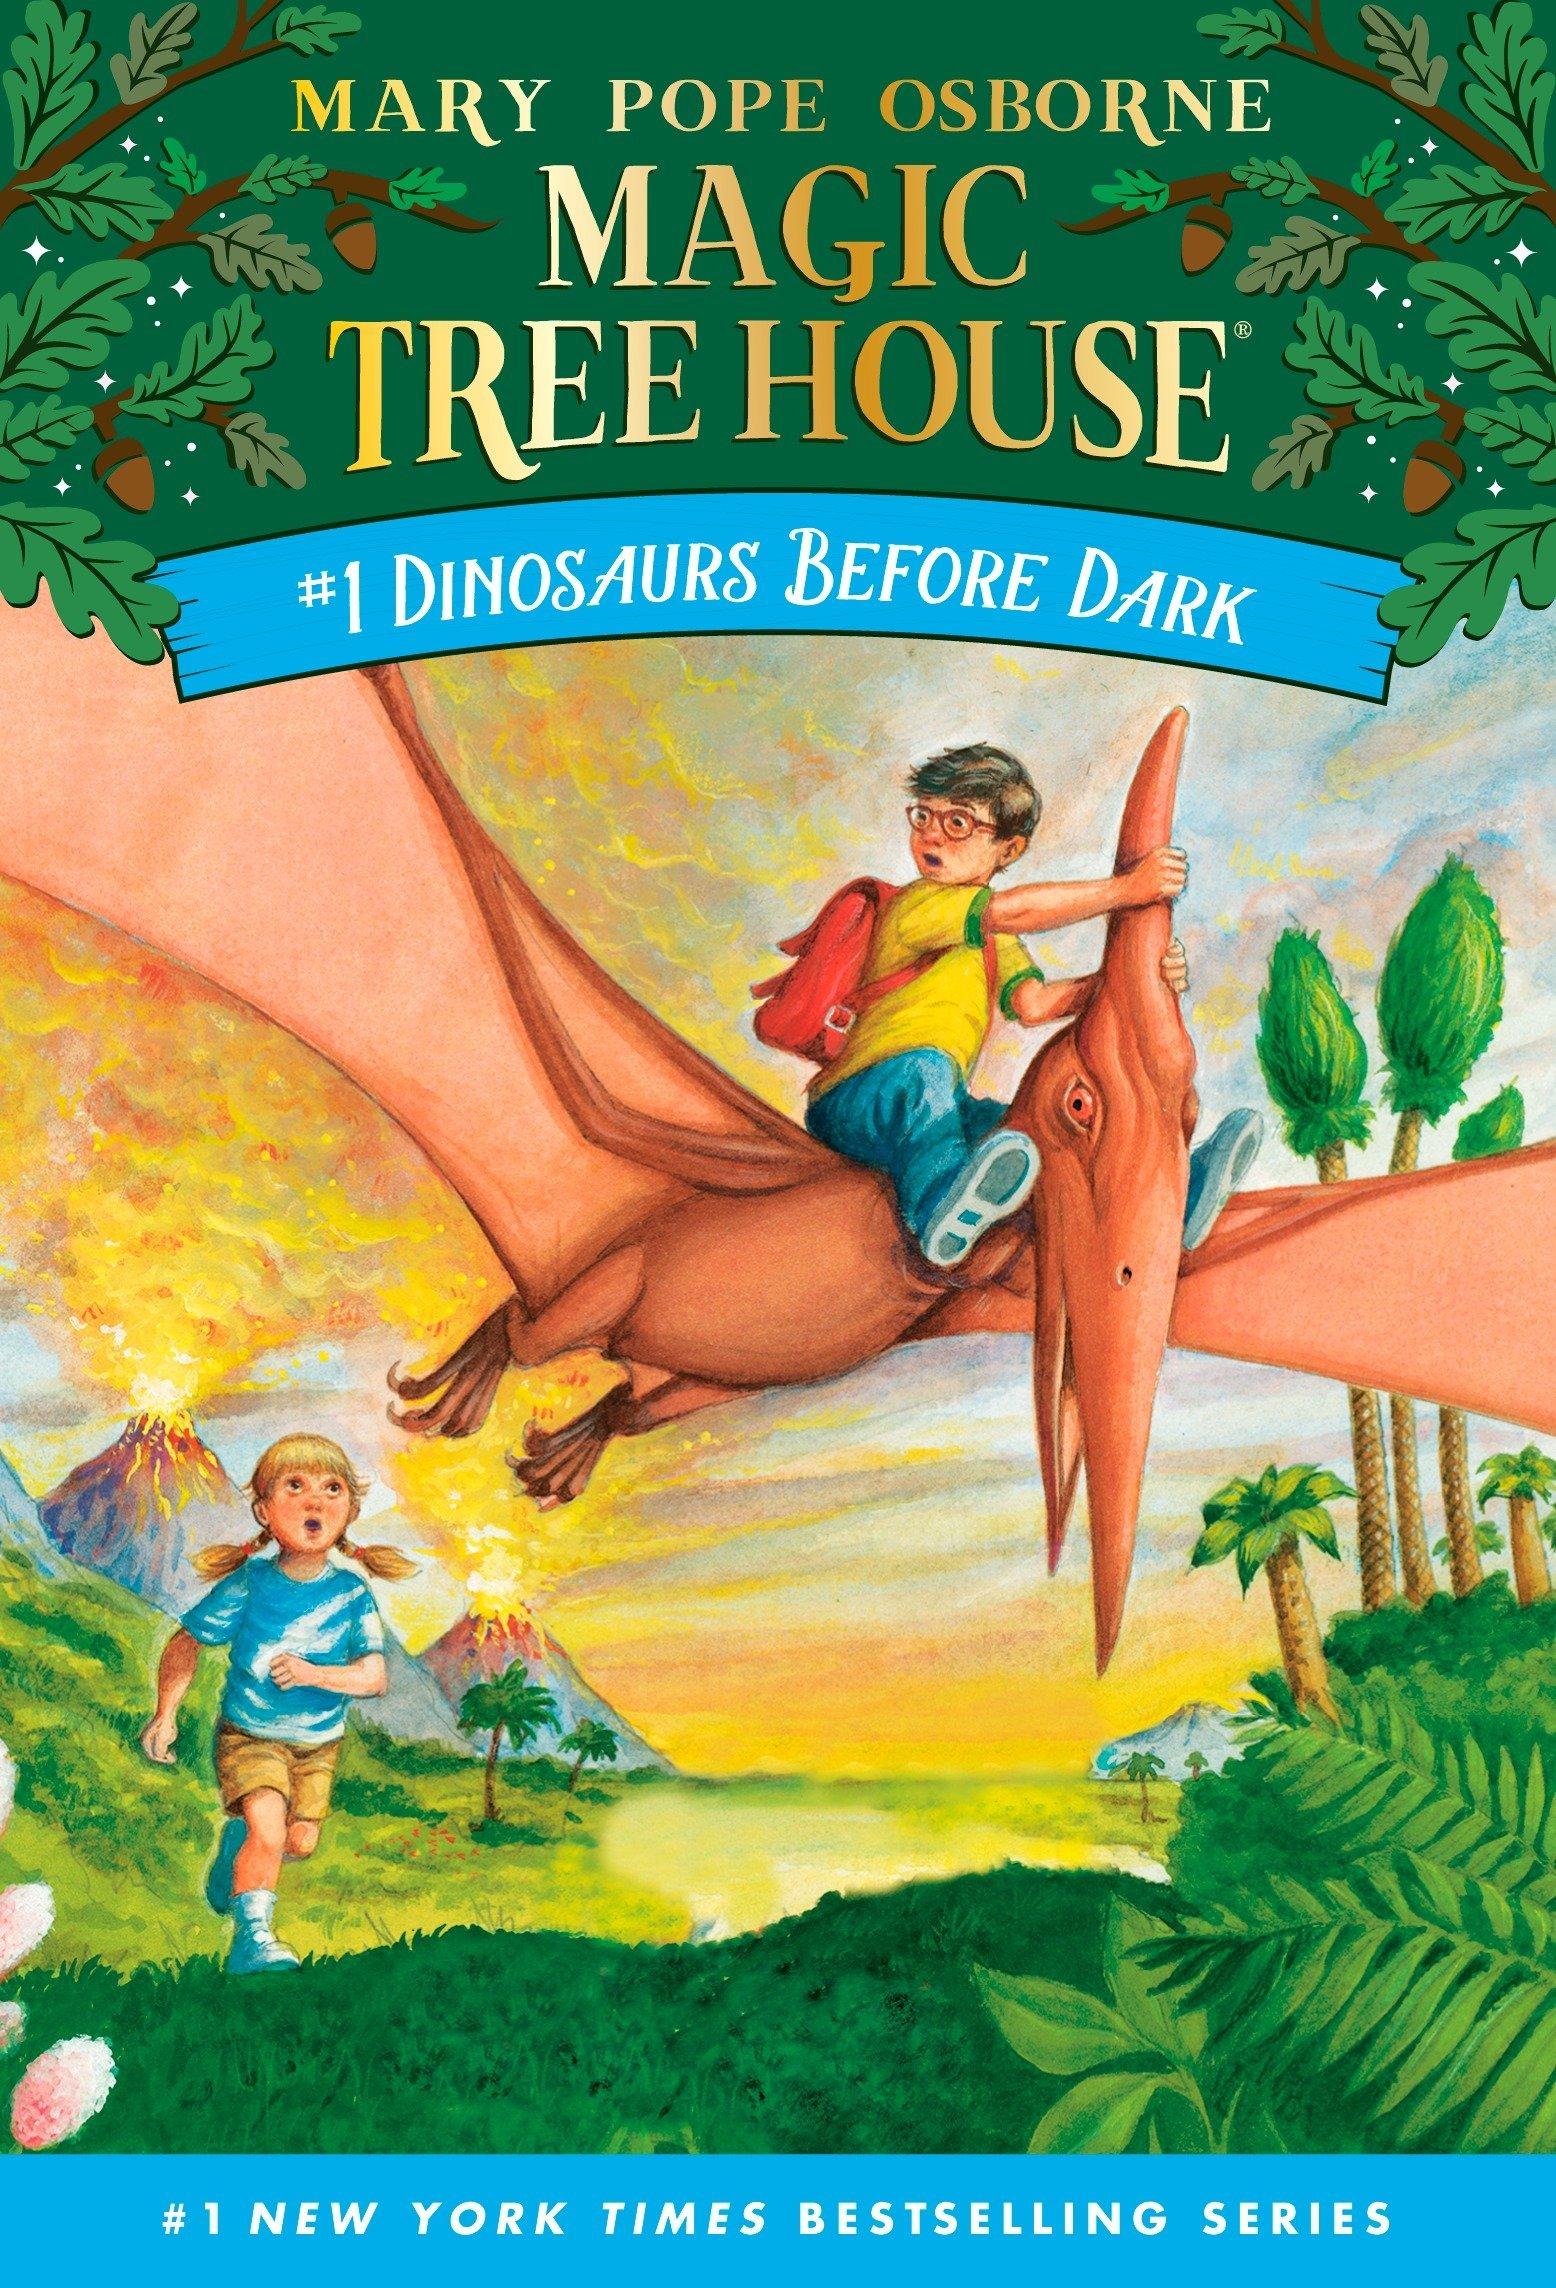 Magic Tree House book series by Mary Pope Osborne.